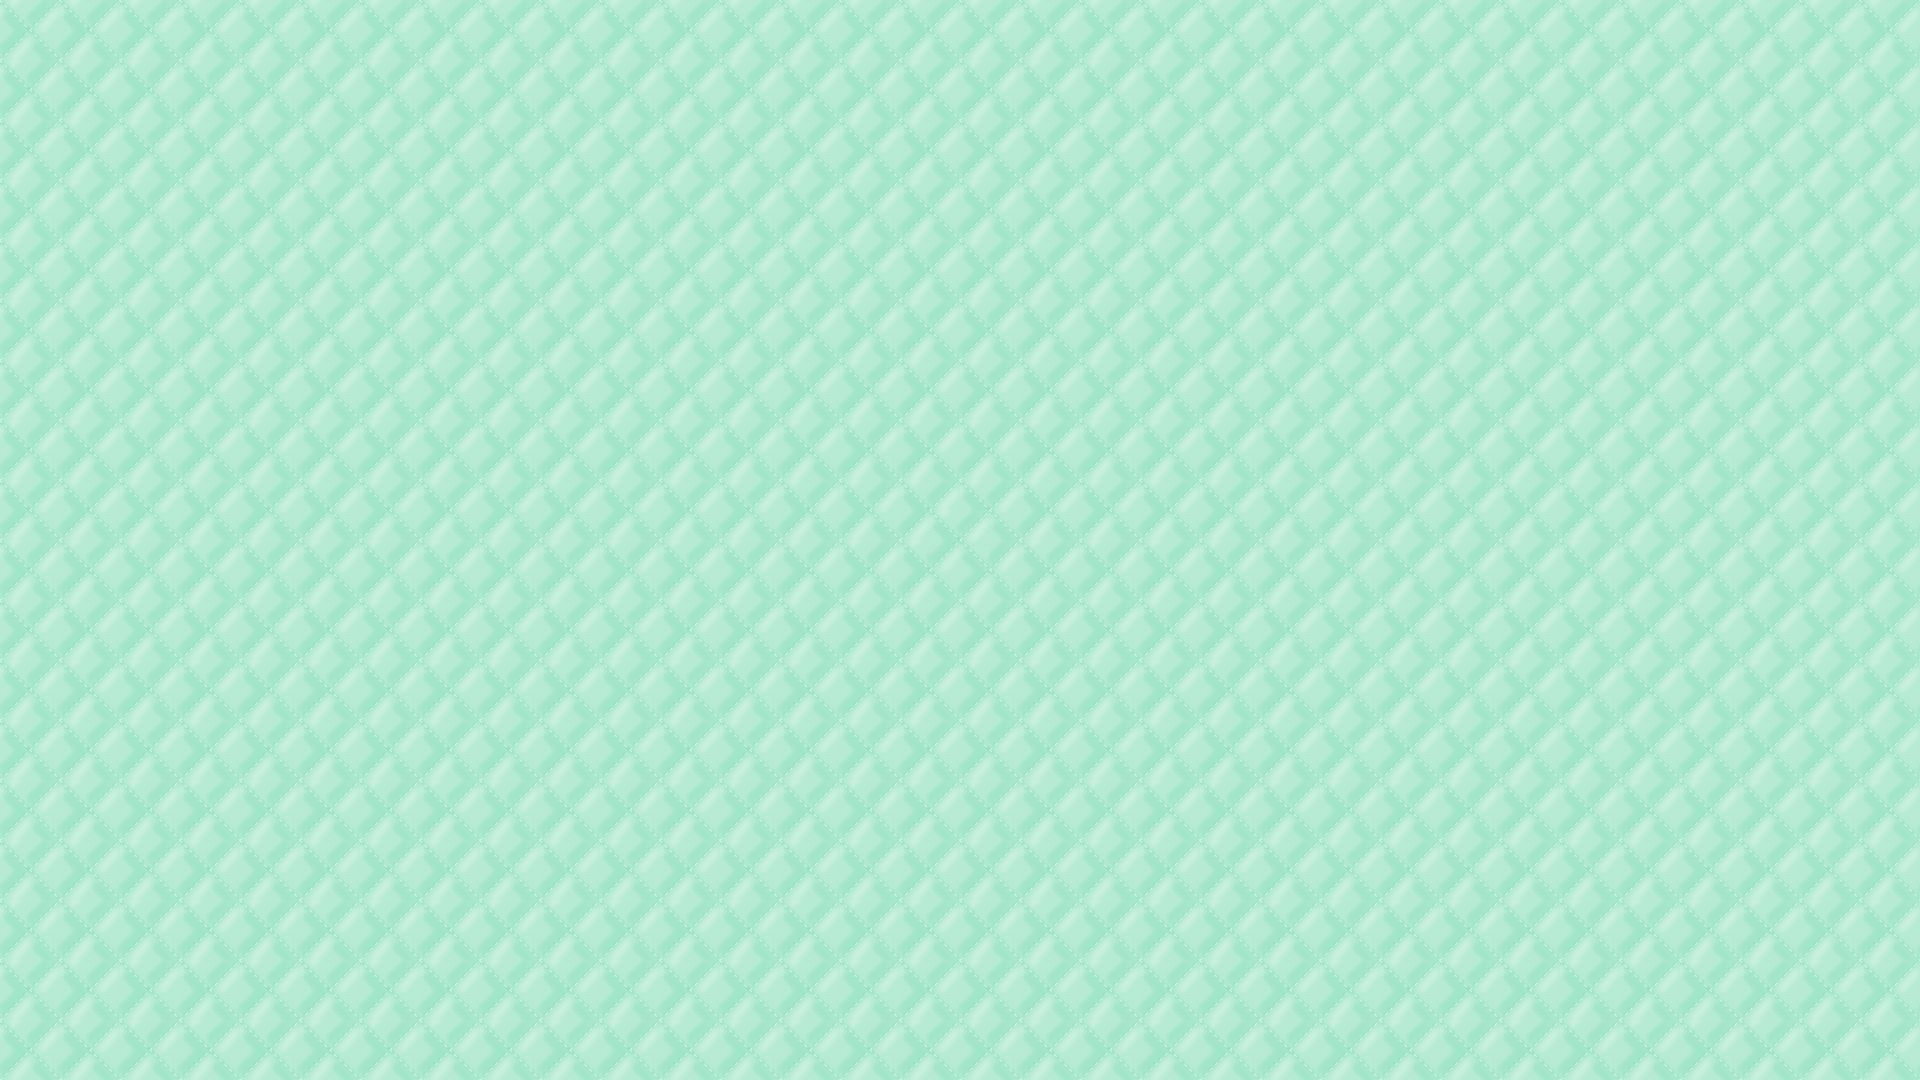 Mint Green HD Desktop Wallpaper